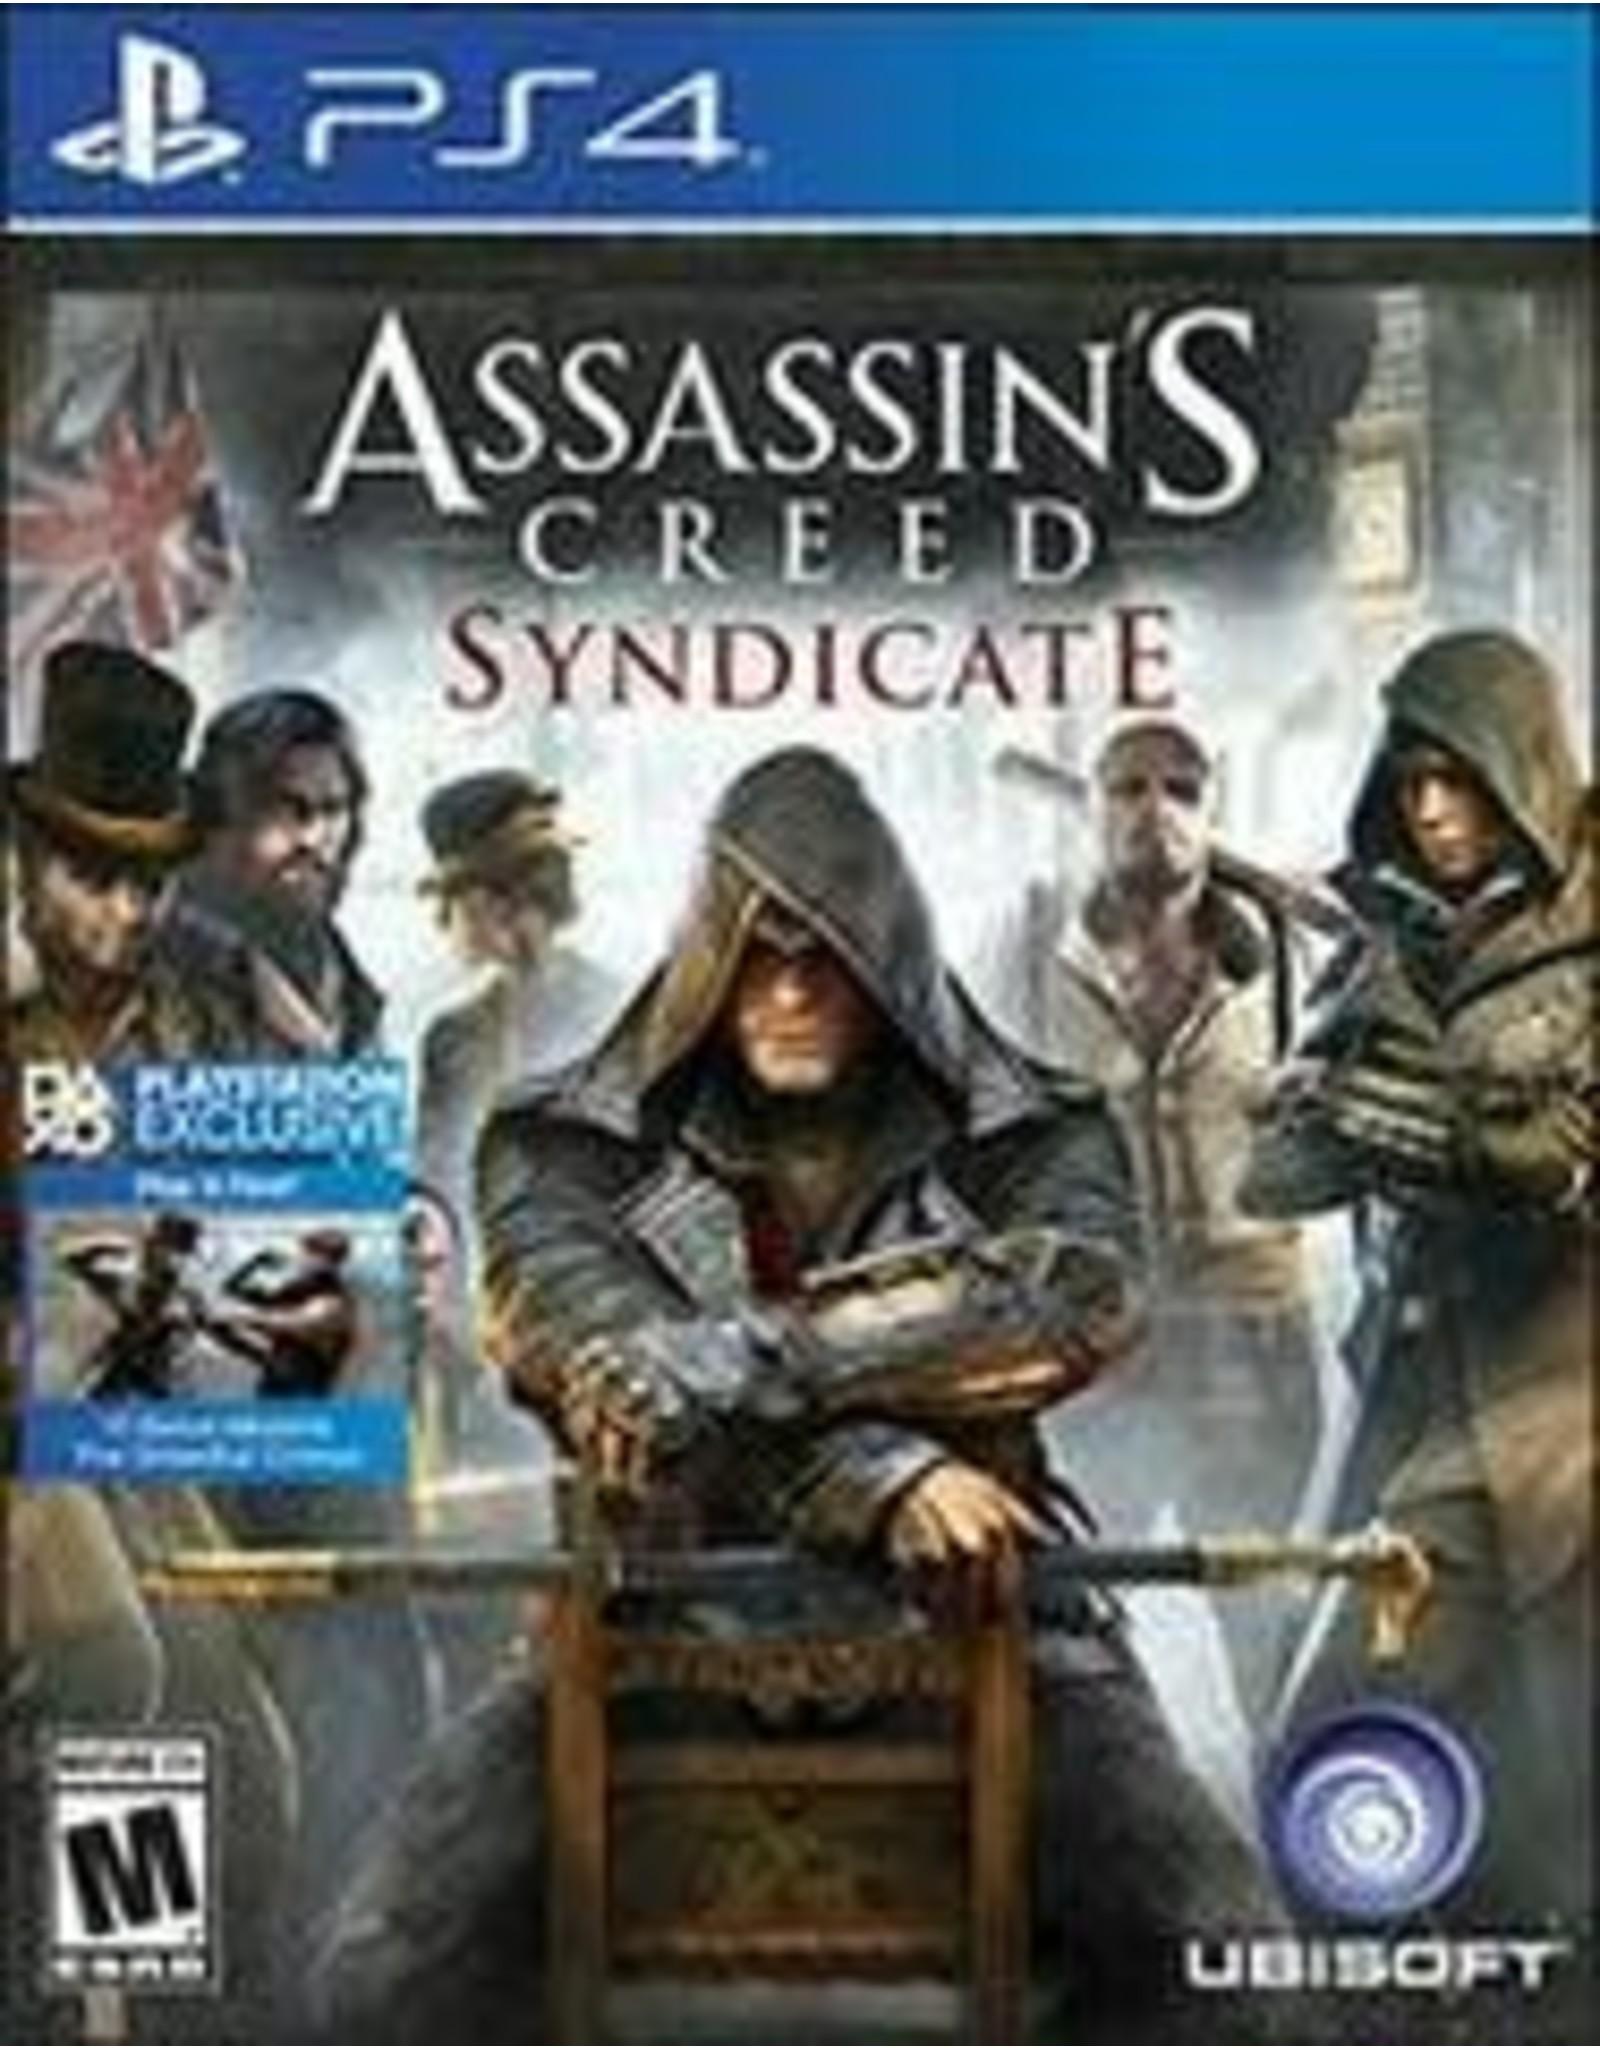 Playstation 4 Assassin's Creed Syndicate (CiB)